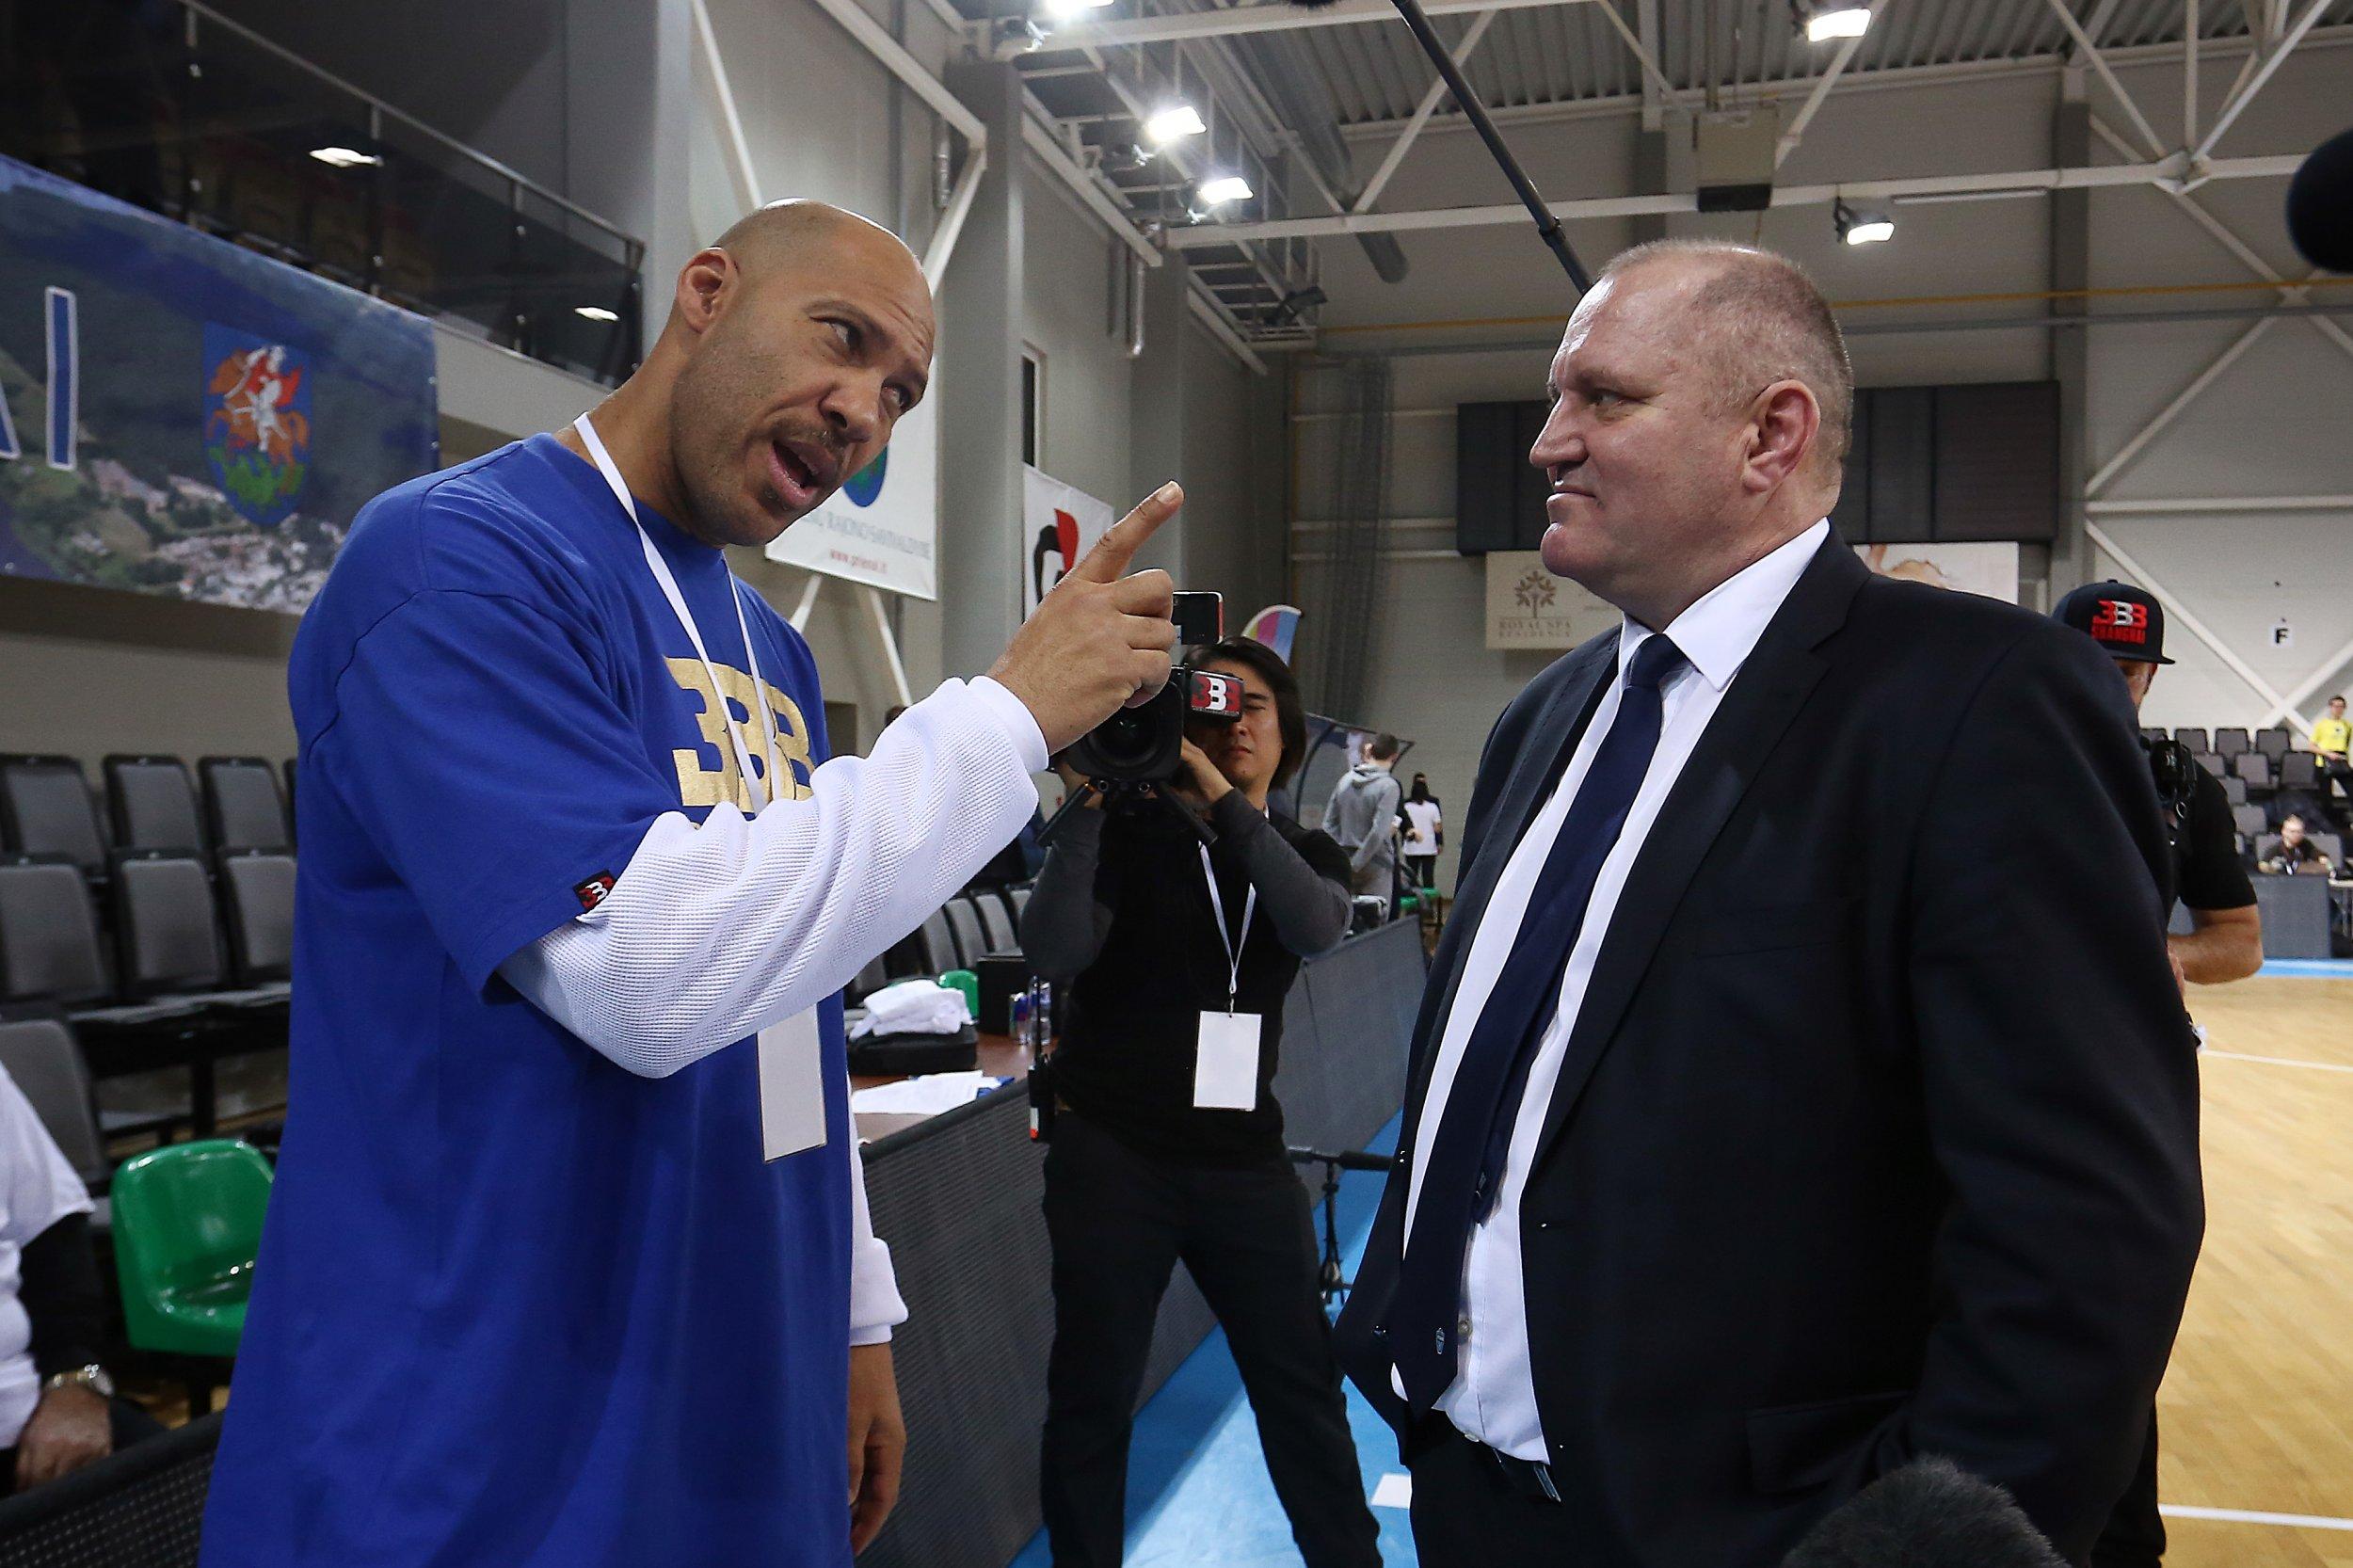 LaVar Ball, father of LiAngelo and LaMelo Ball, talks to Virginijus Seskus, head coach of Vytautas Prienai, in Prienai, Lithuania, January 9.